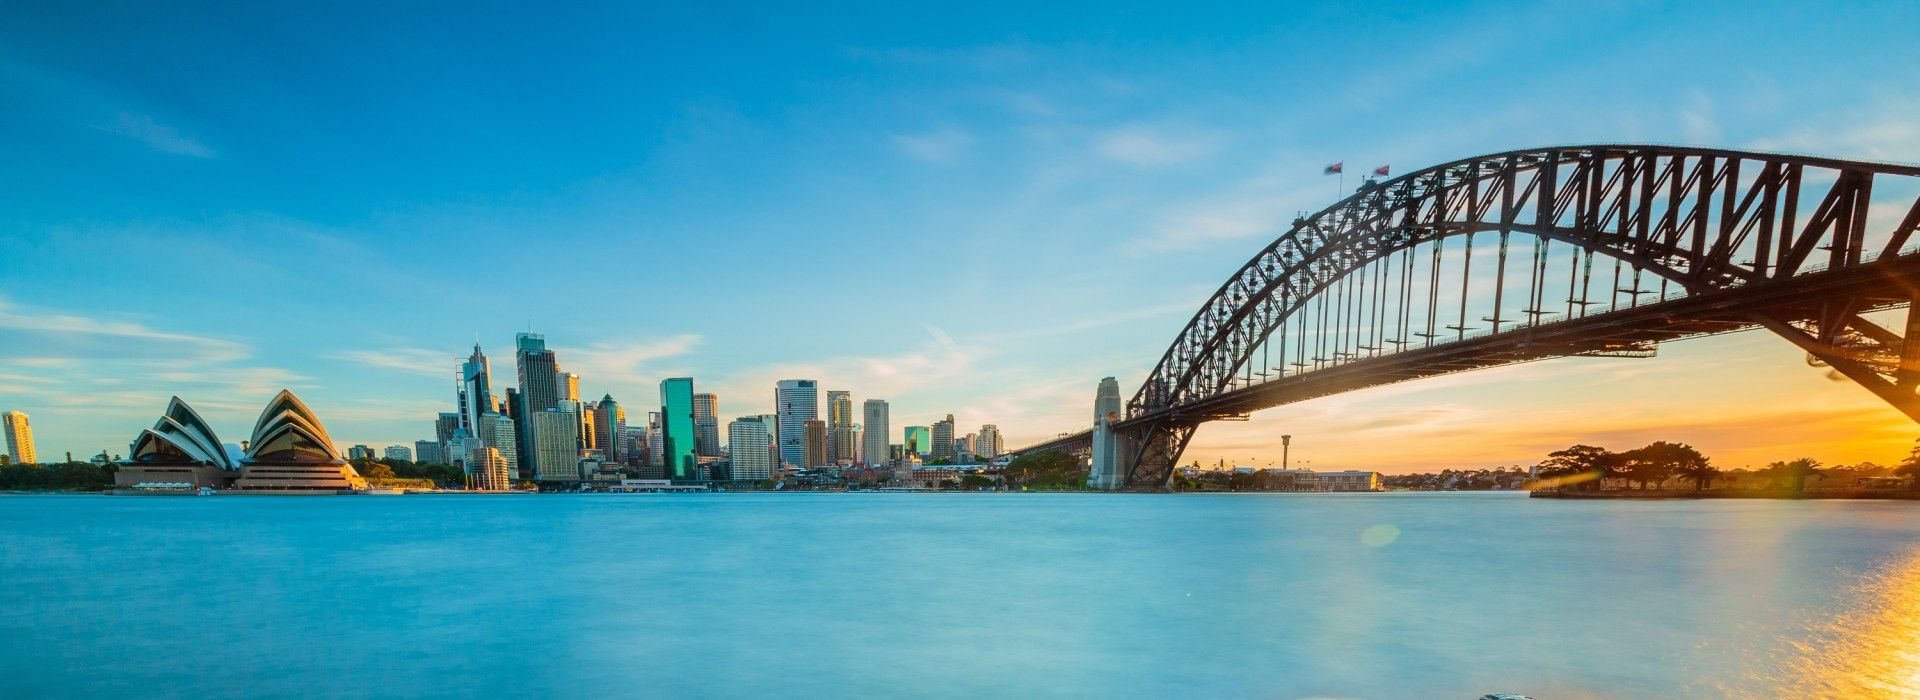 Oceania Tours and Trips to Oceania